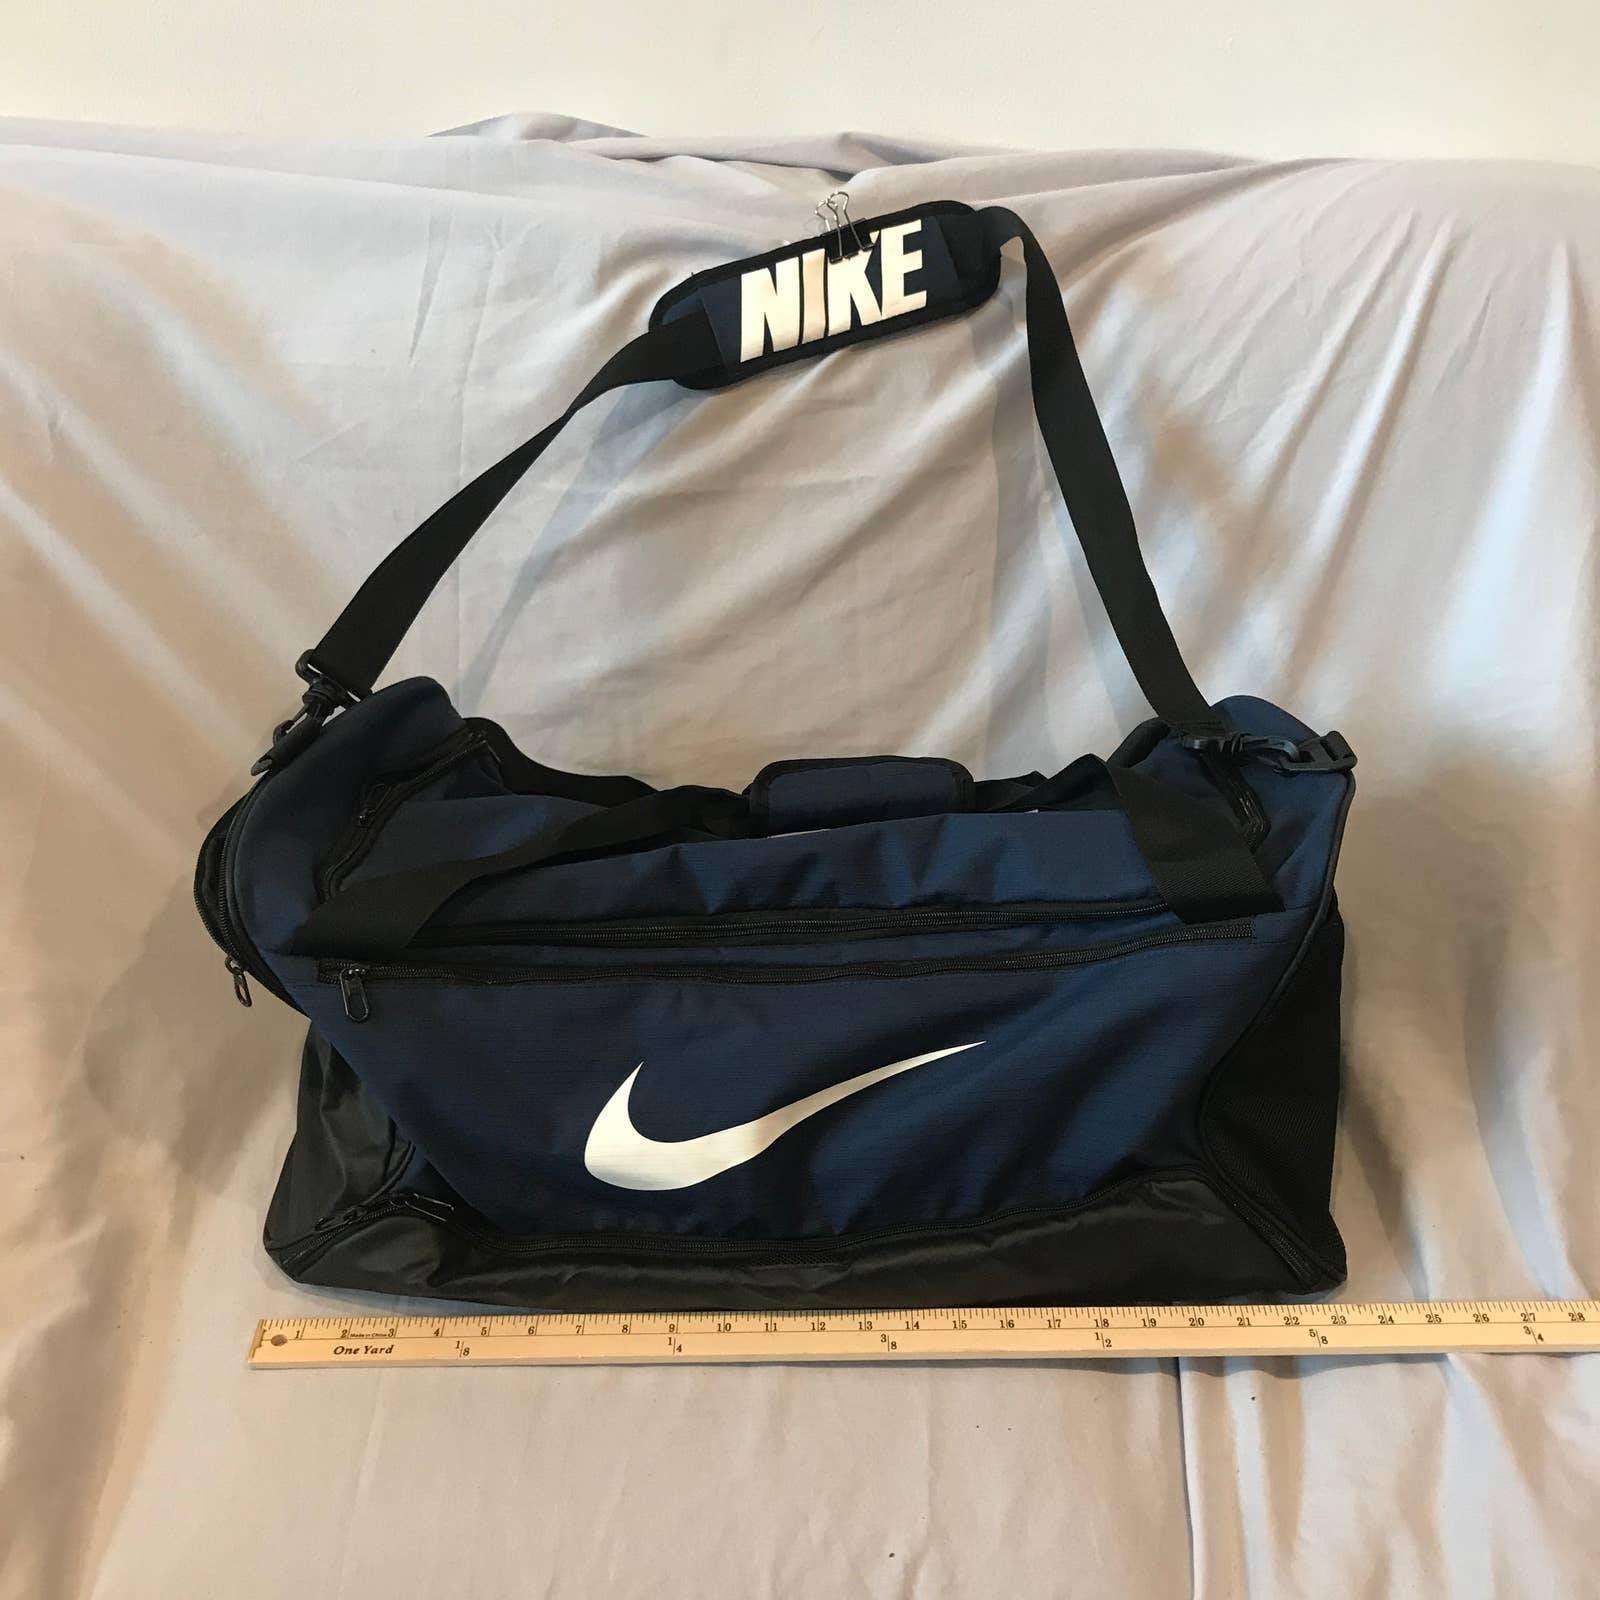 Nike Duffel Bag, Navy Blue 002